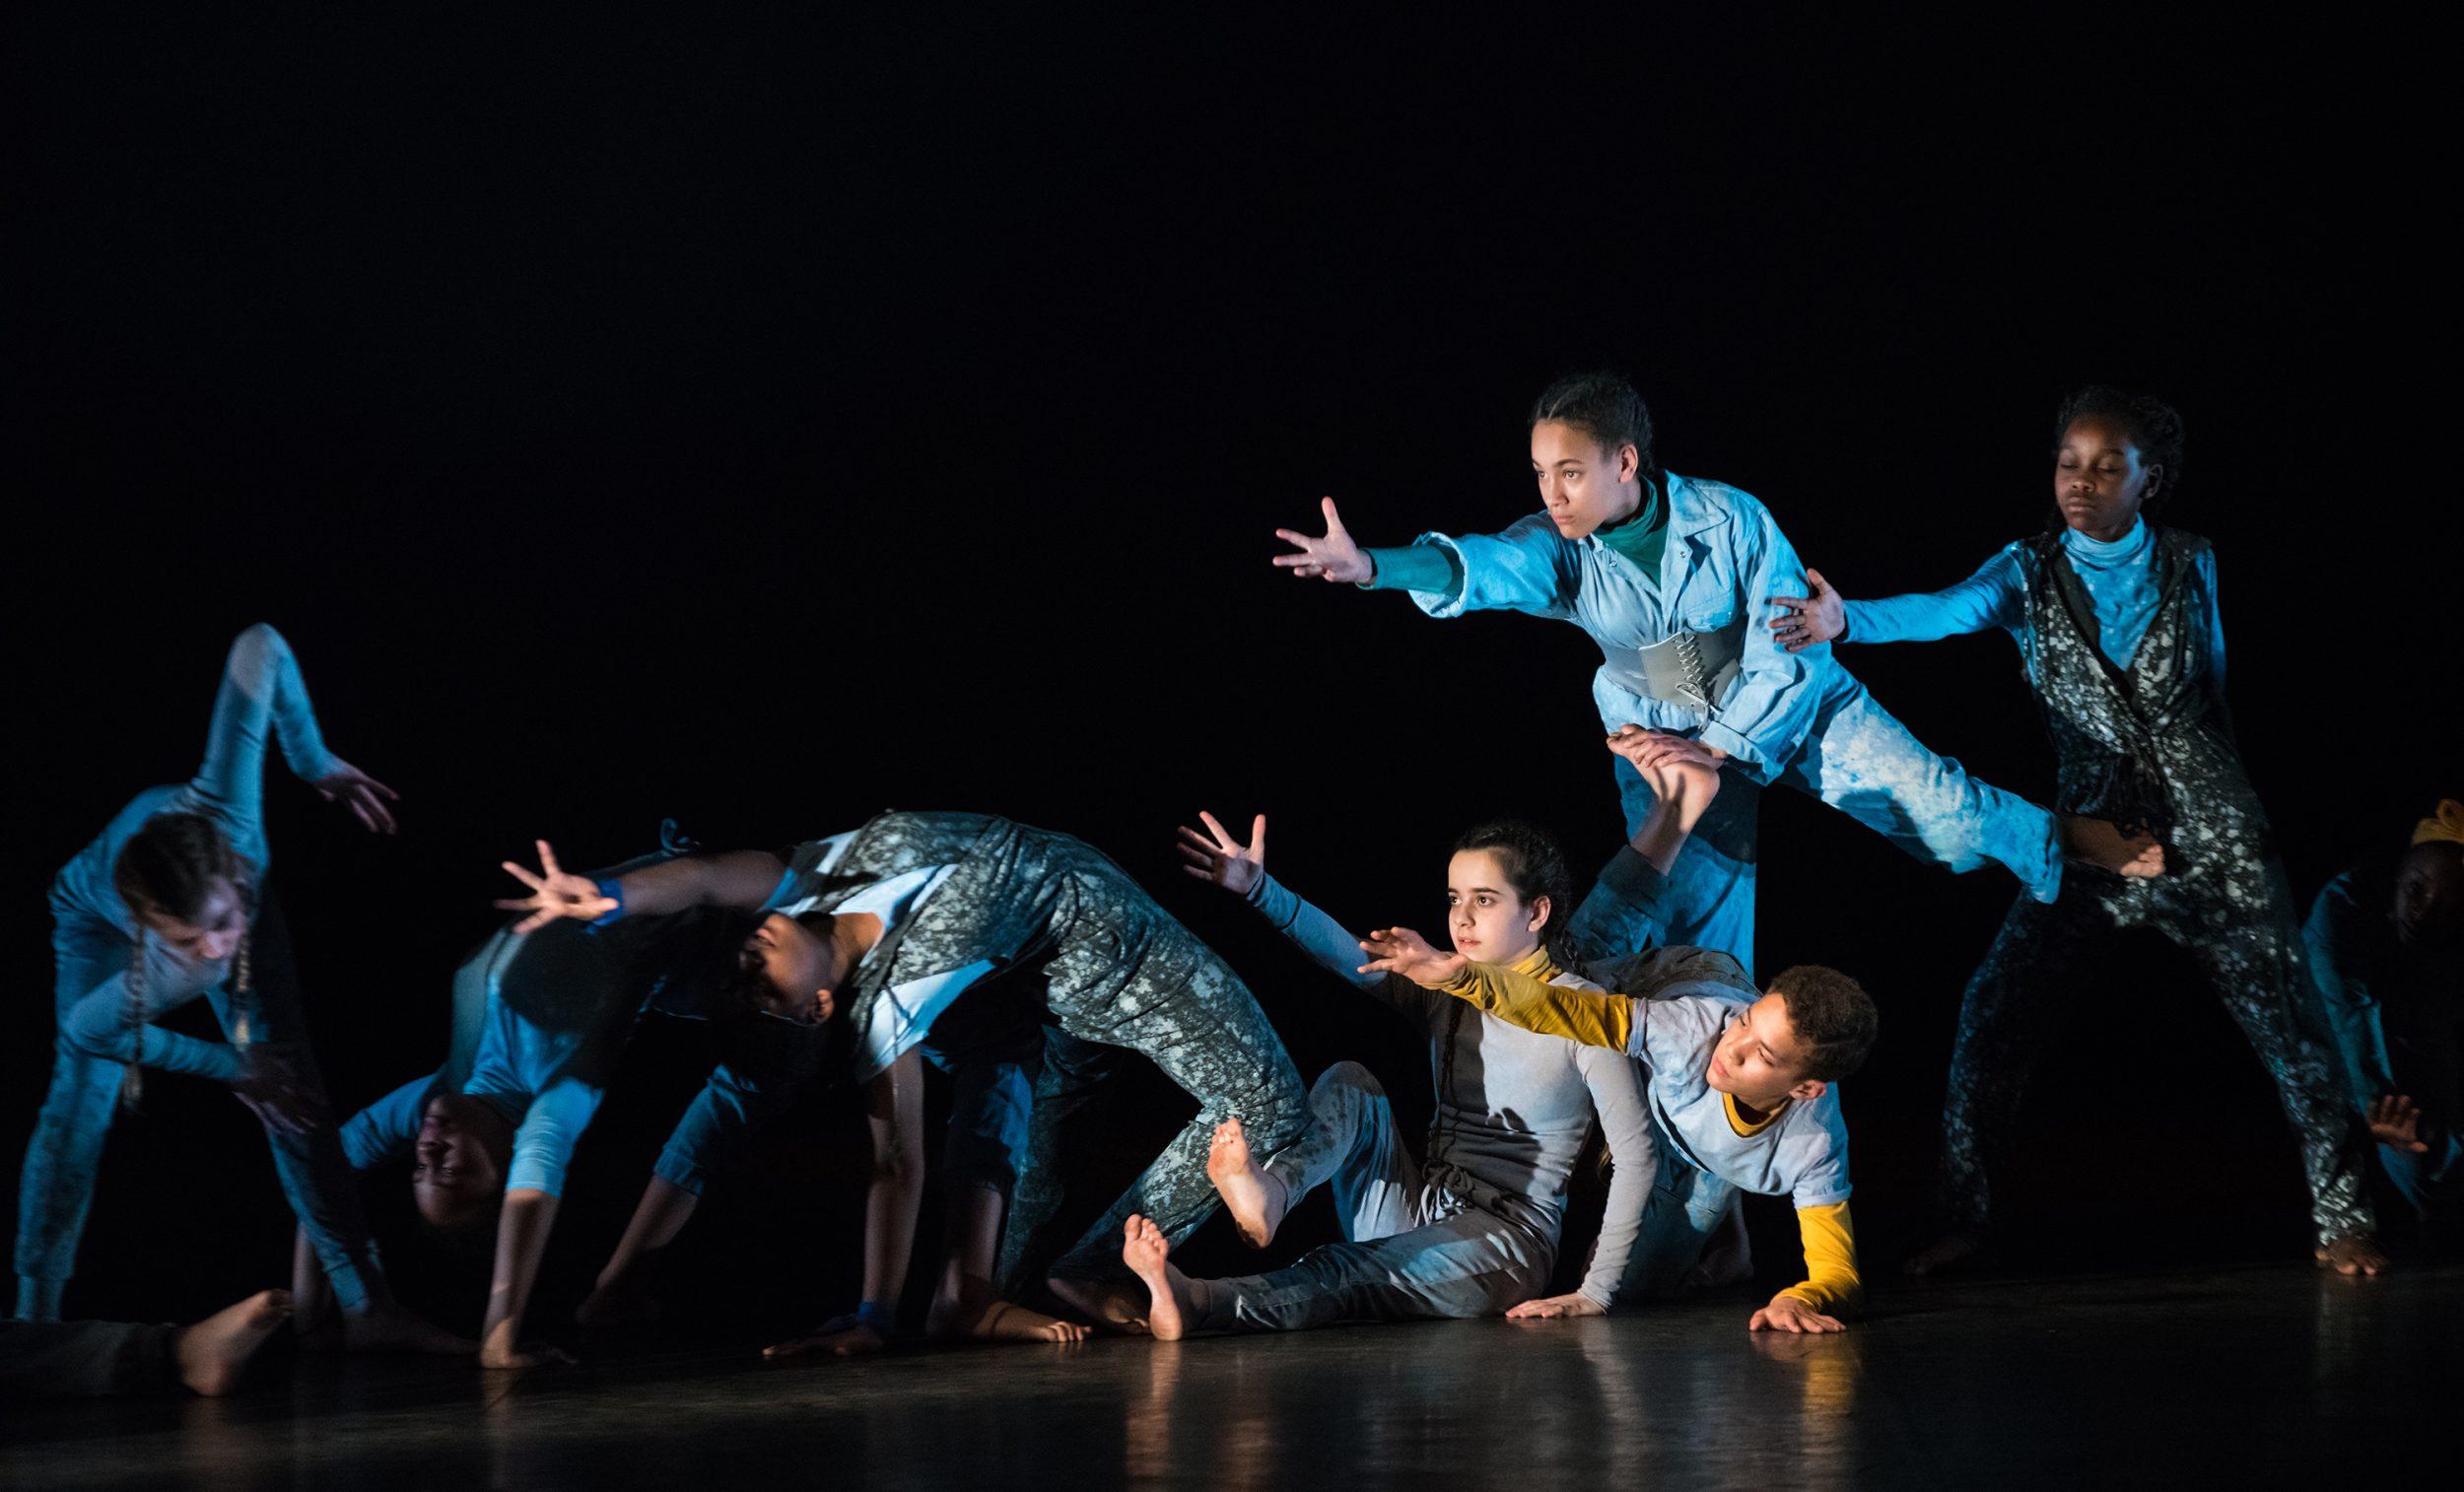 Dance-Journeys-2017-photo-Danilo-Moroni